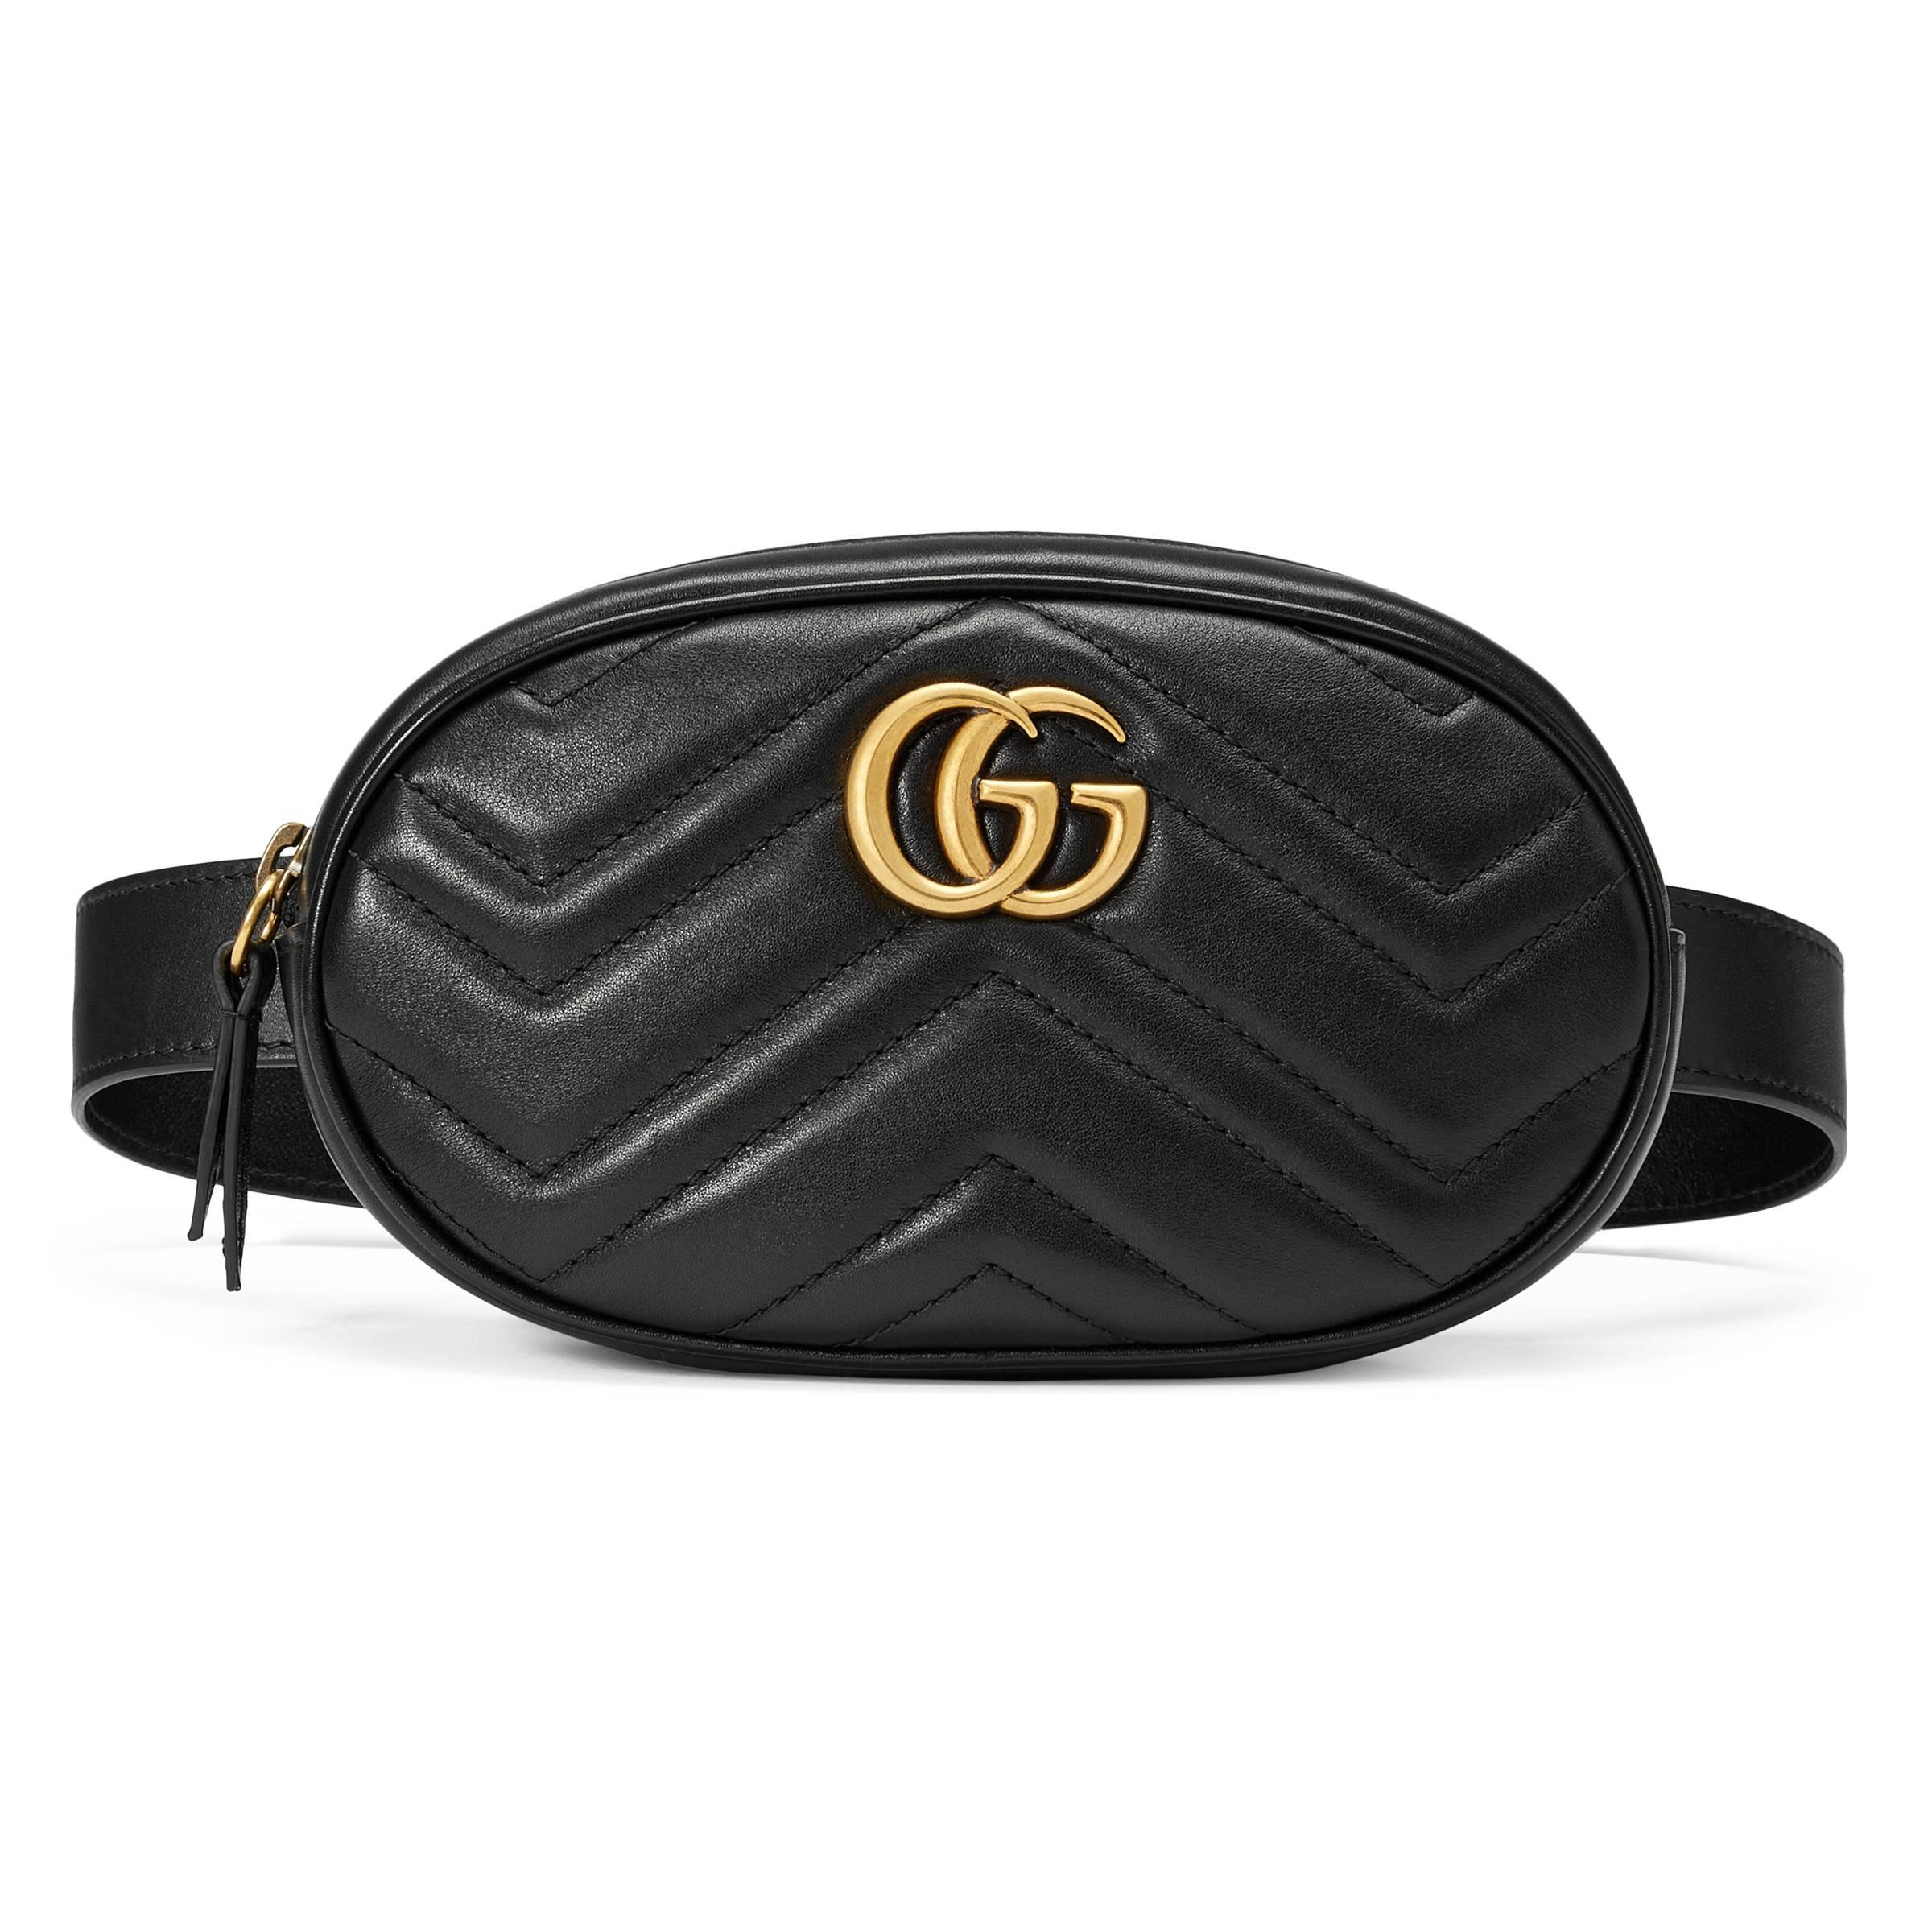 46bc0241a888 Gucci - Black Gg Marmont Matelassé Leather Belt Bag - Lyst. View fullscreen